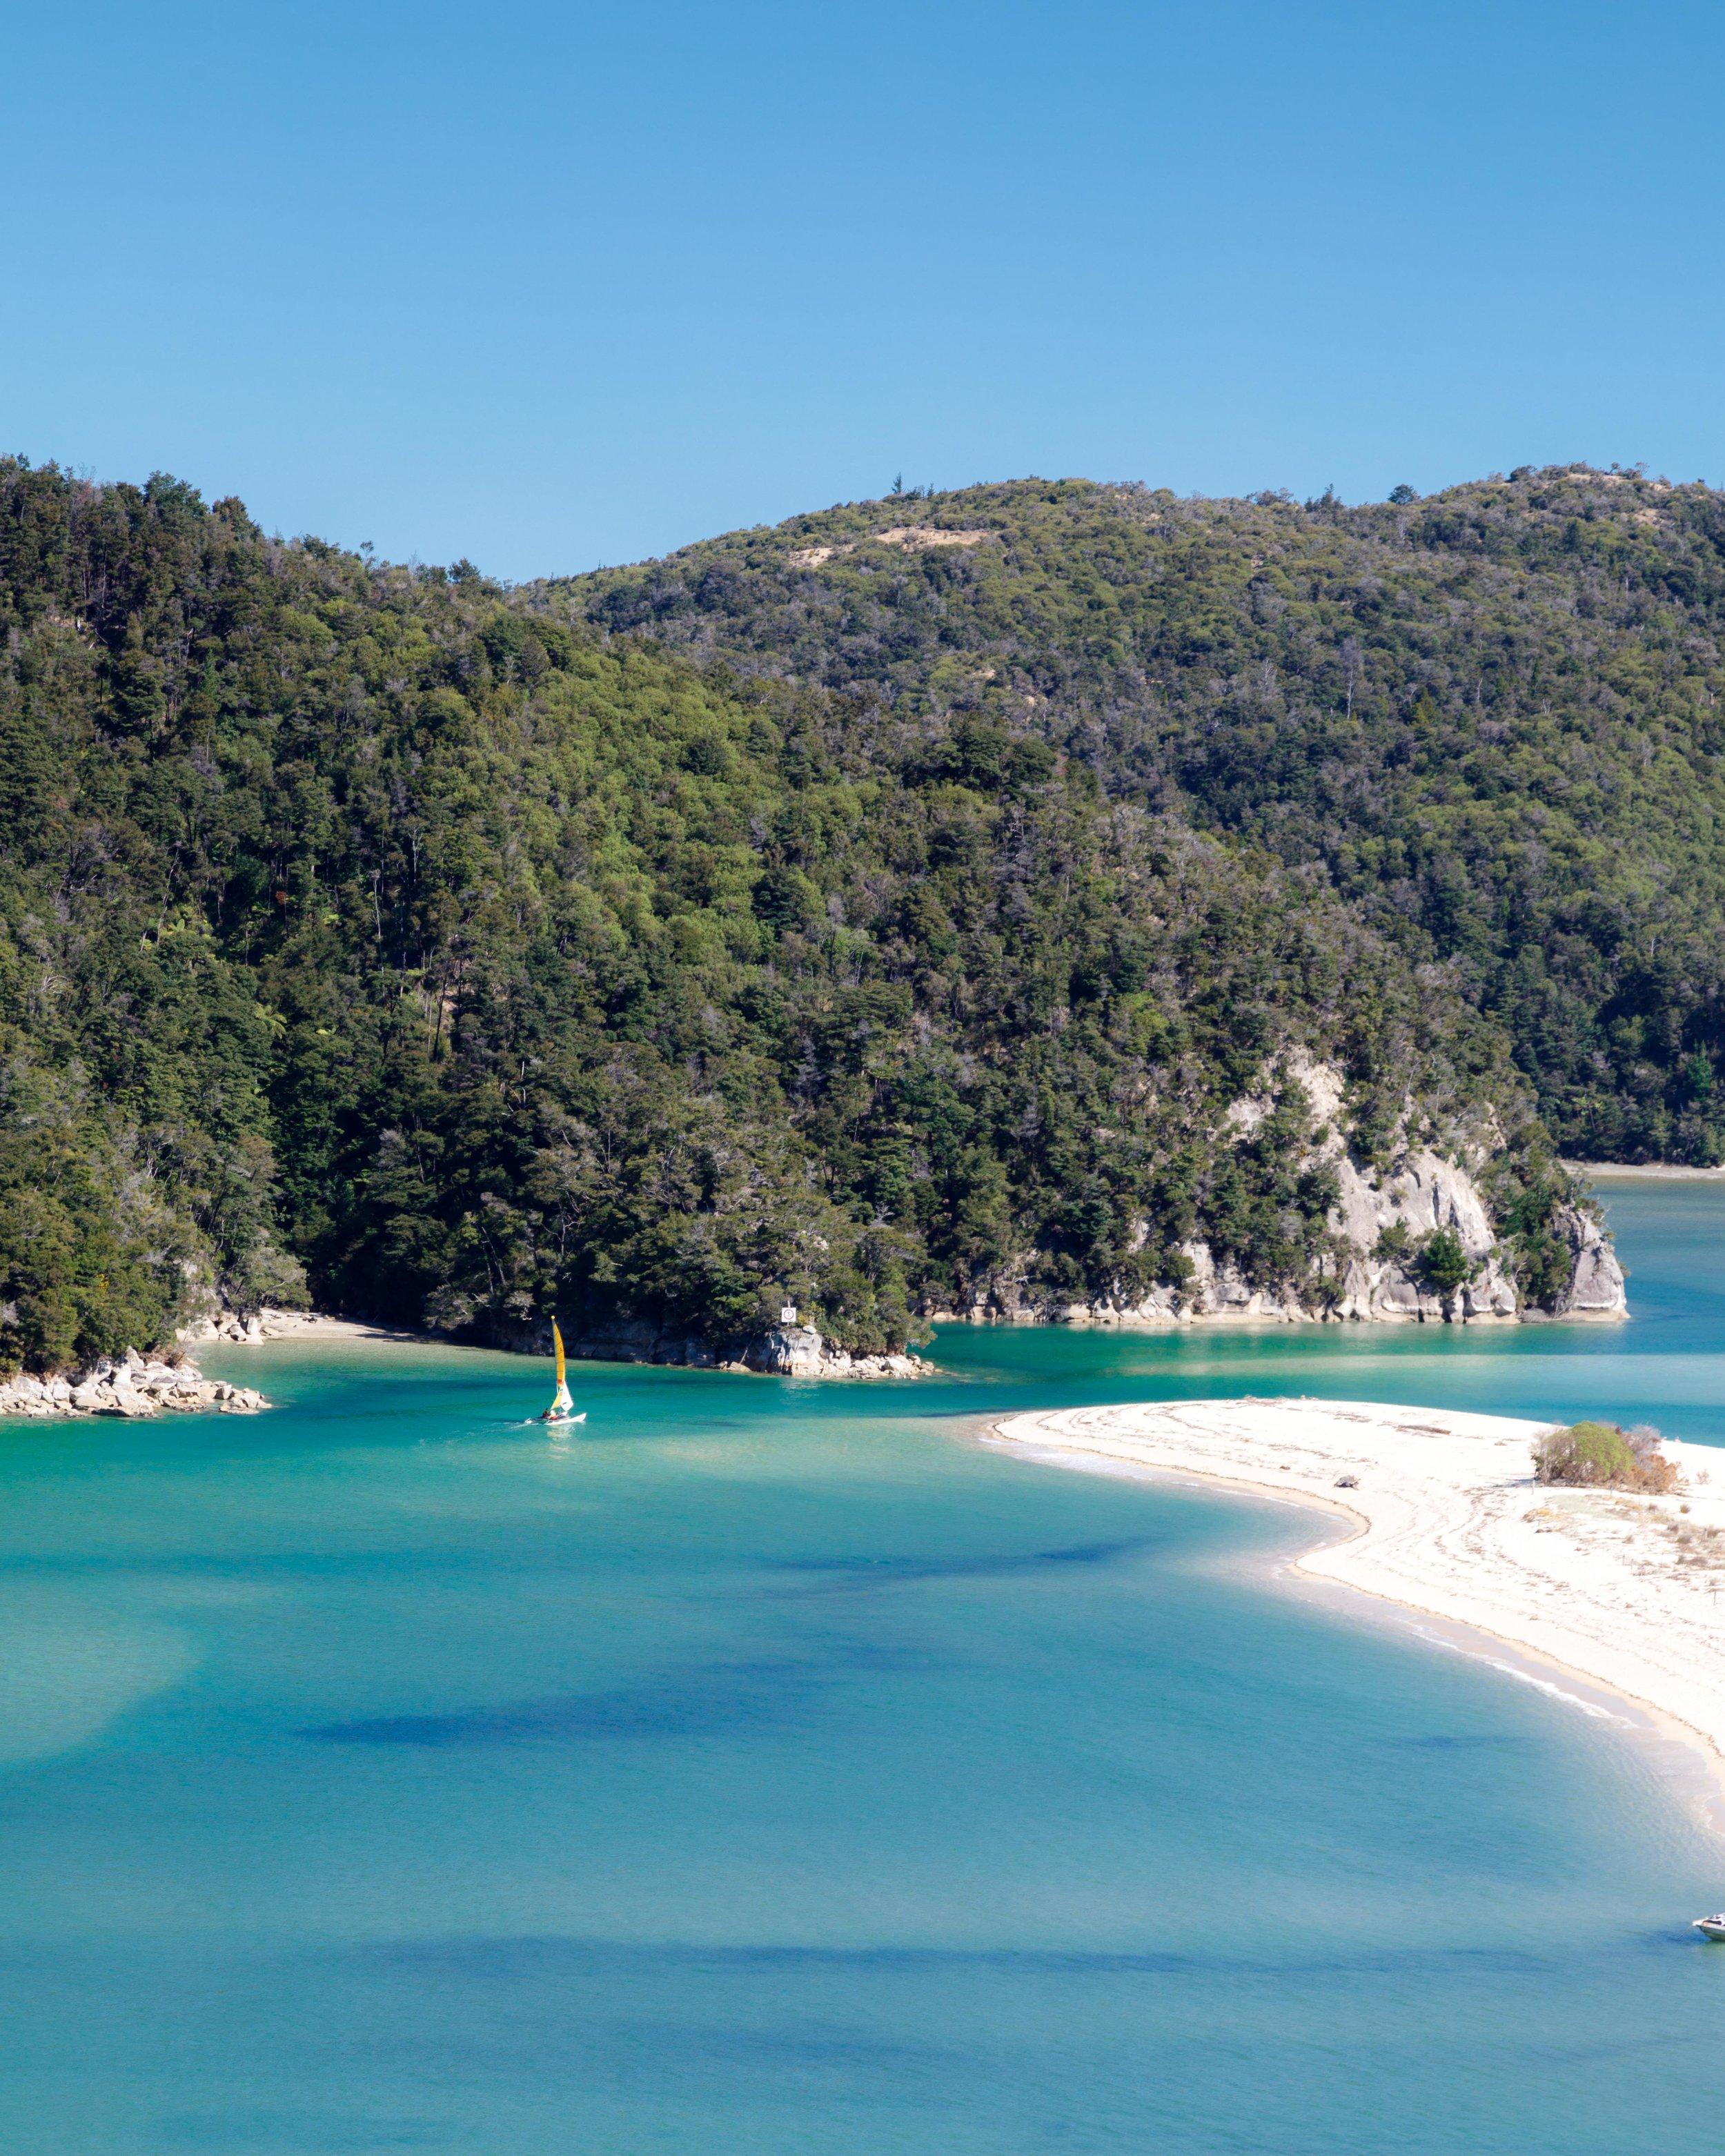 2 week New Zealand South Island Itinerary: Abel Tasman Coast Track